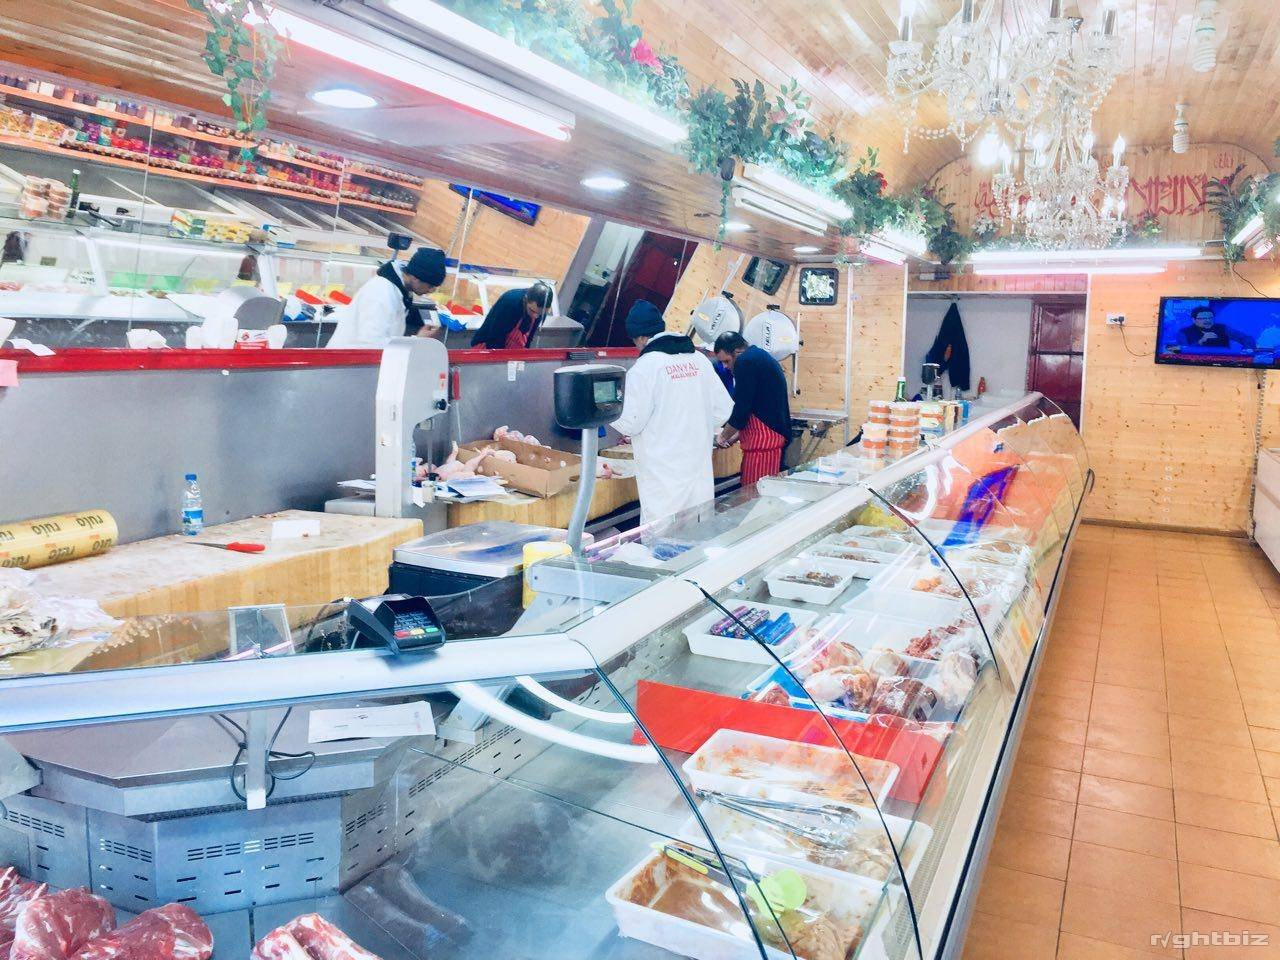 Halal Meat Shop Running Business For Sale - Image 1